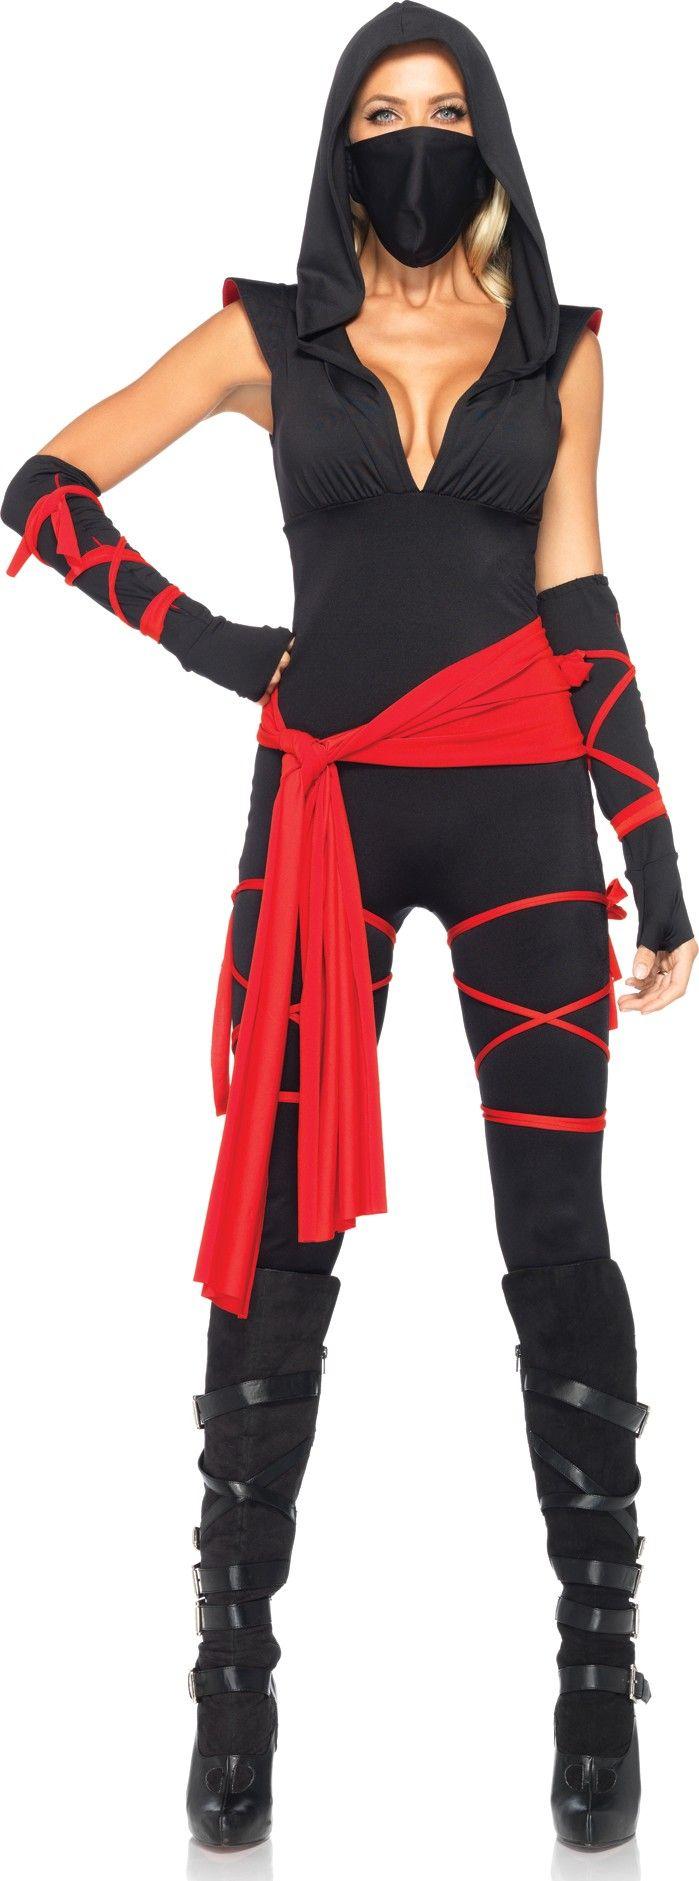 sexy ninja asia damenkost m schwarz rot. Black Bedroom Furniture Sets. Home Design Ideas